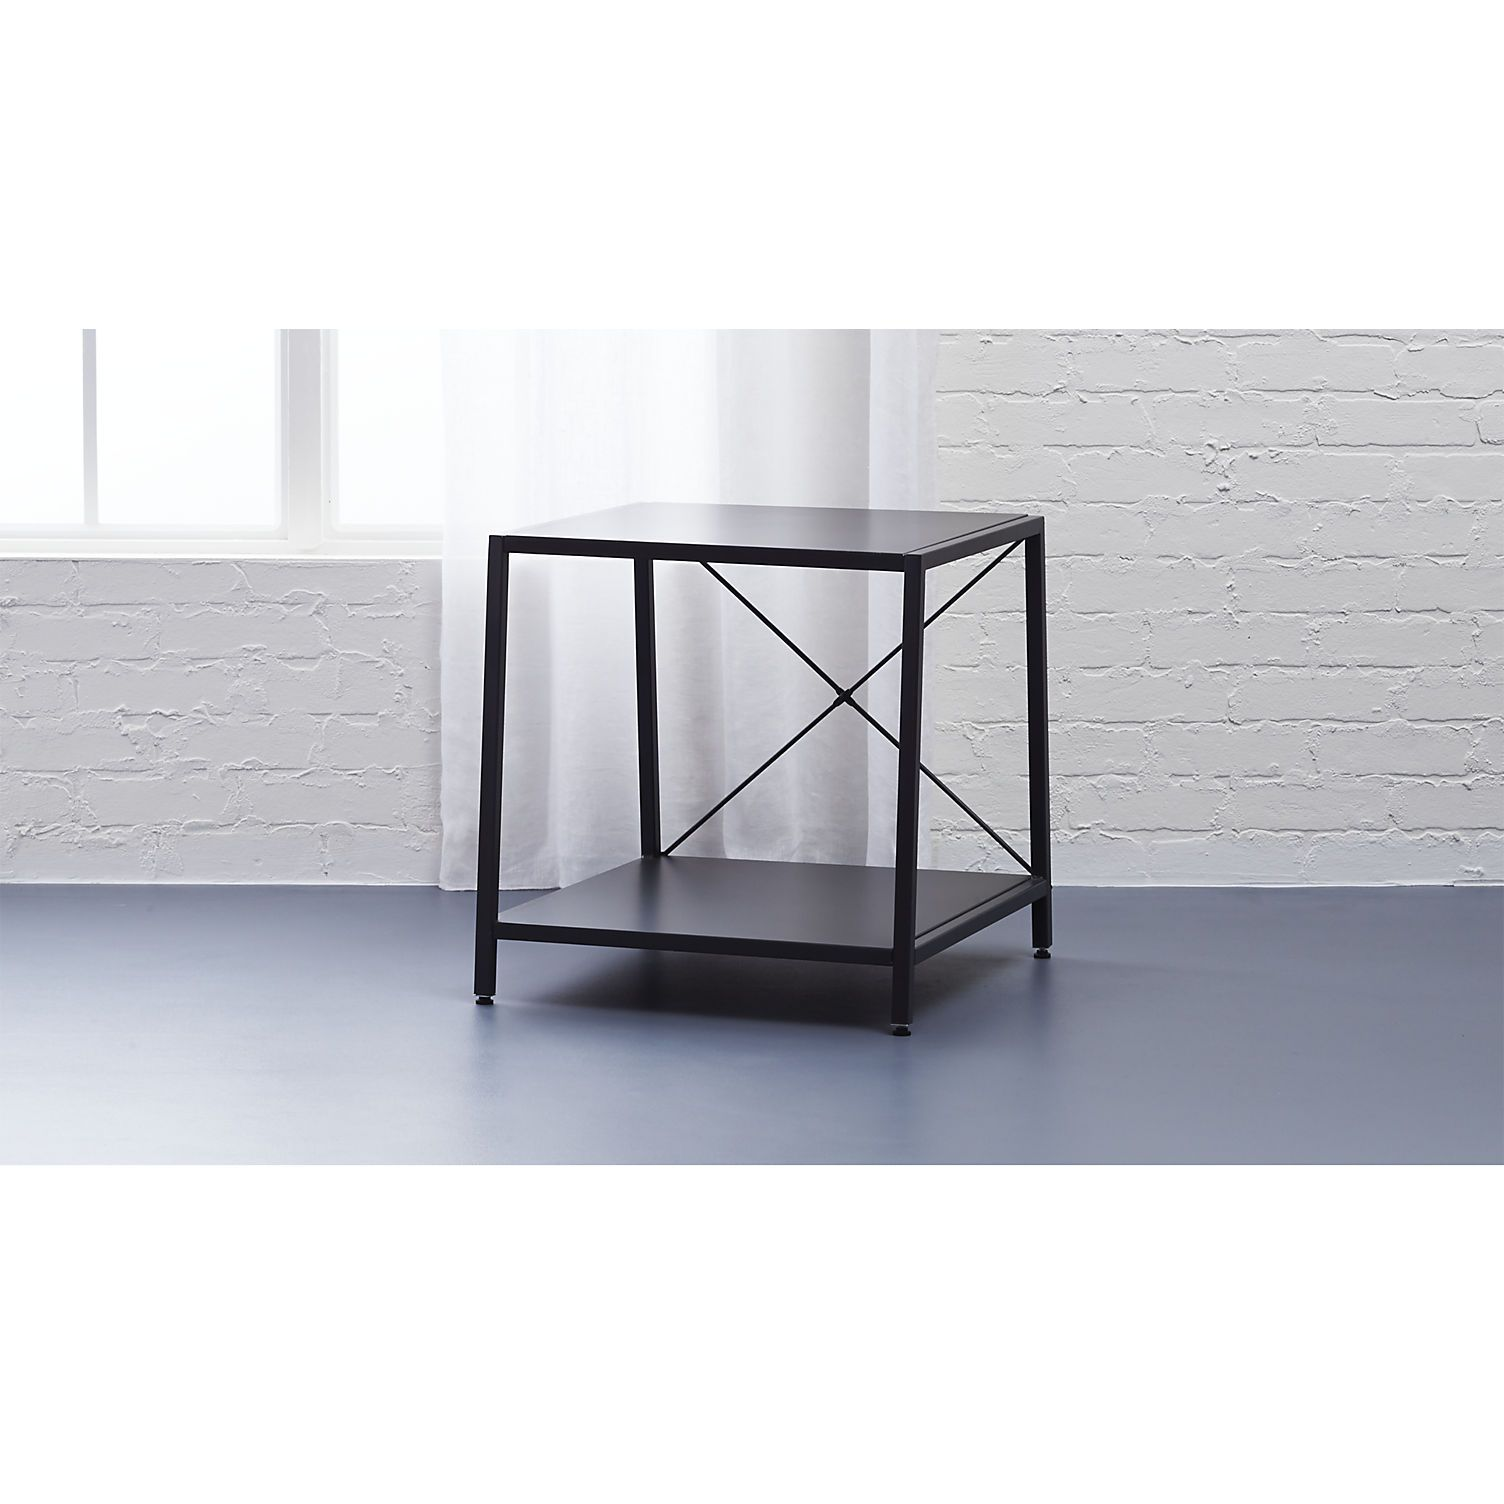 Shop harvey carbon grey nightstand. Architectural X-brace